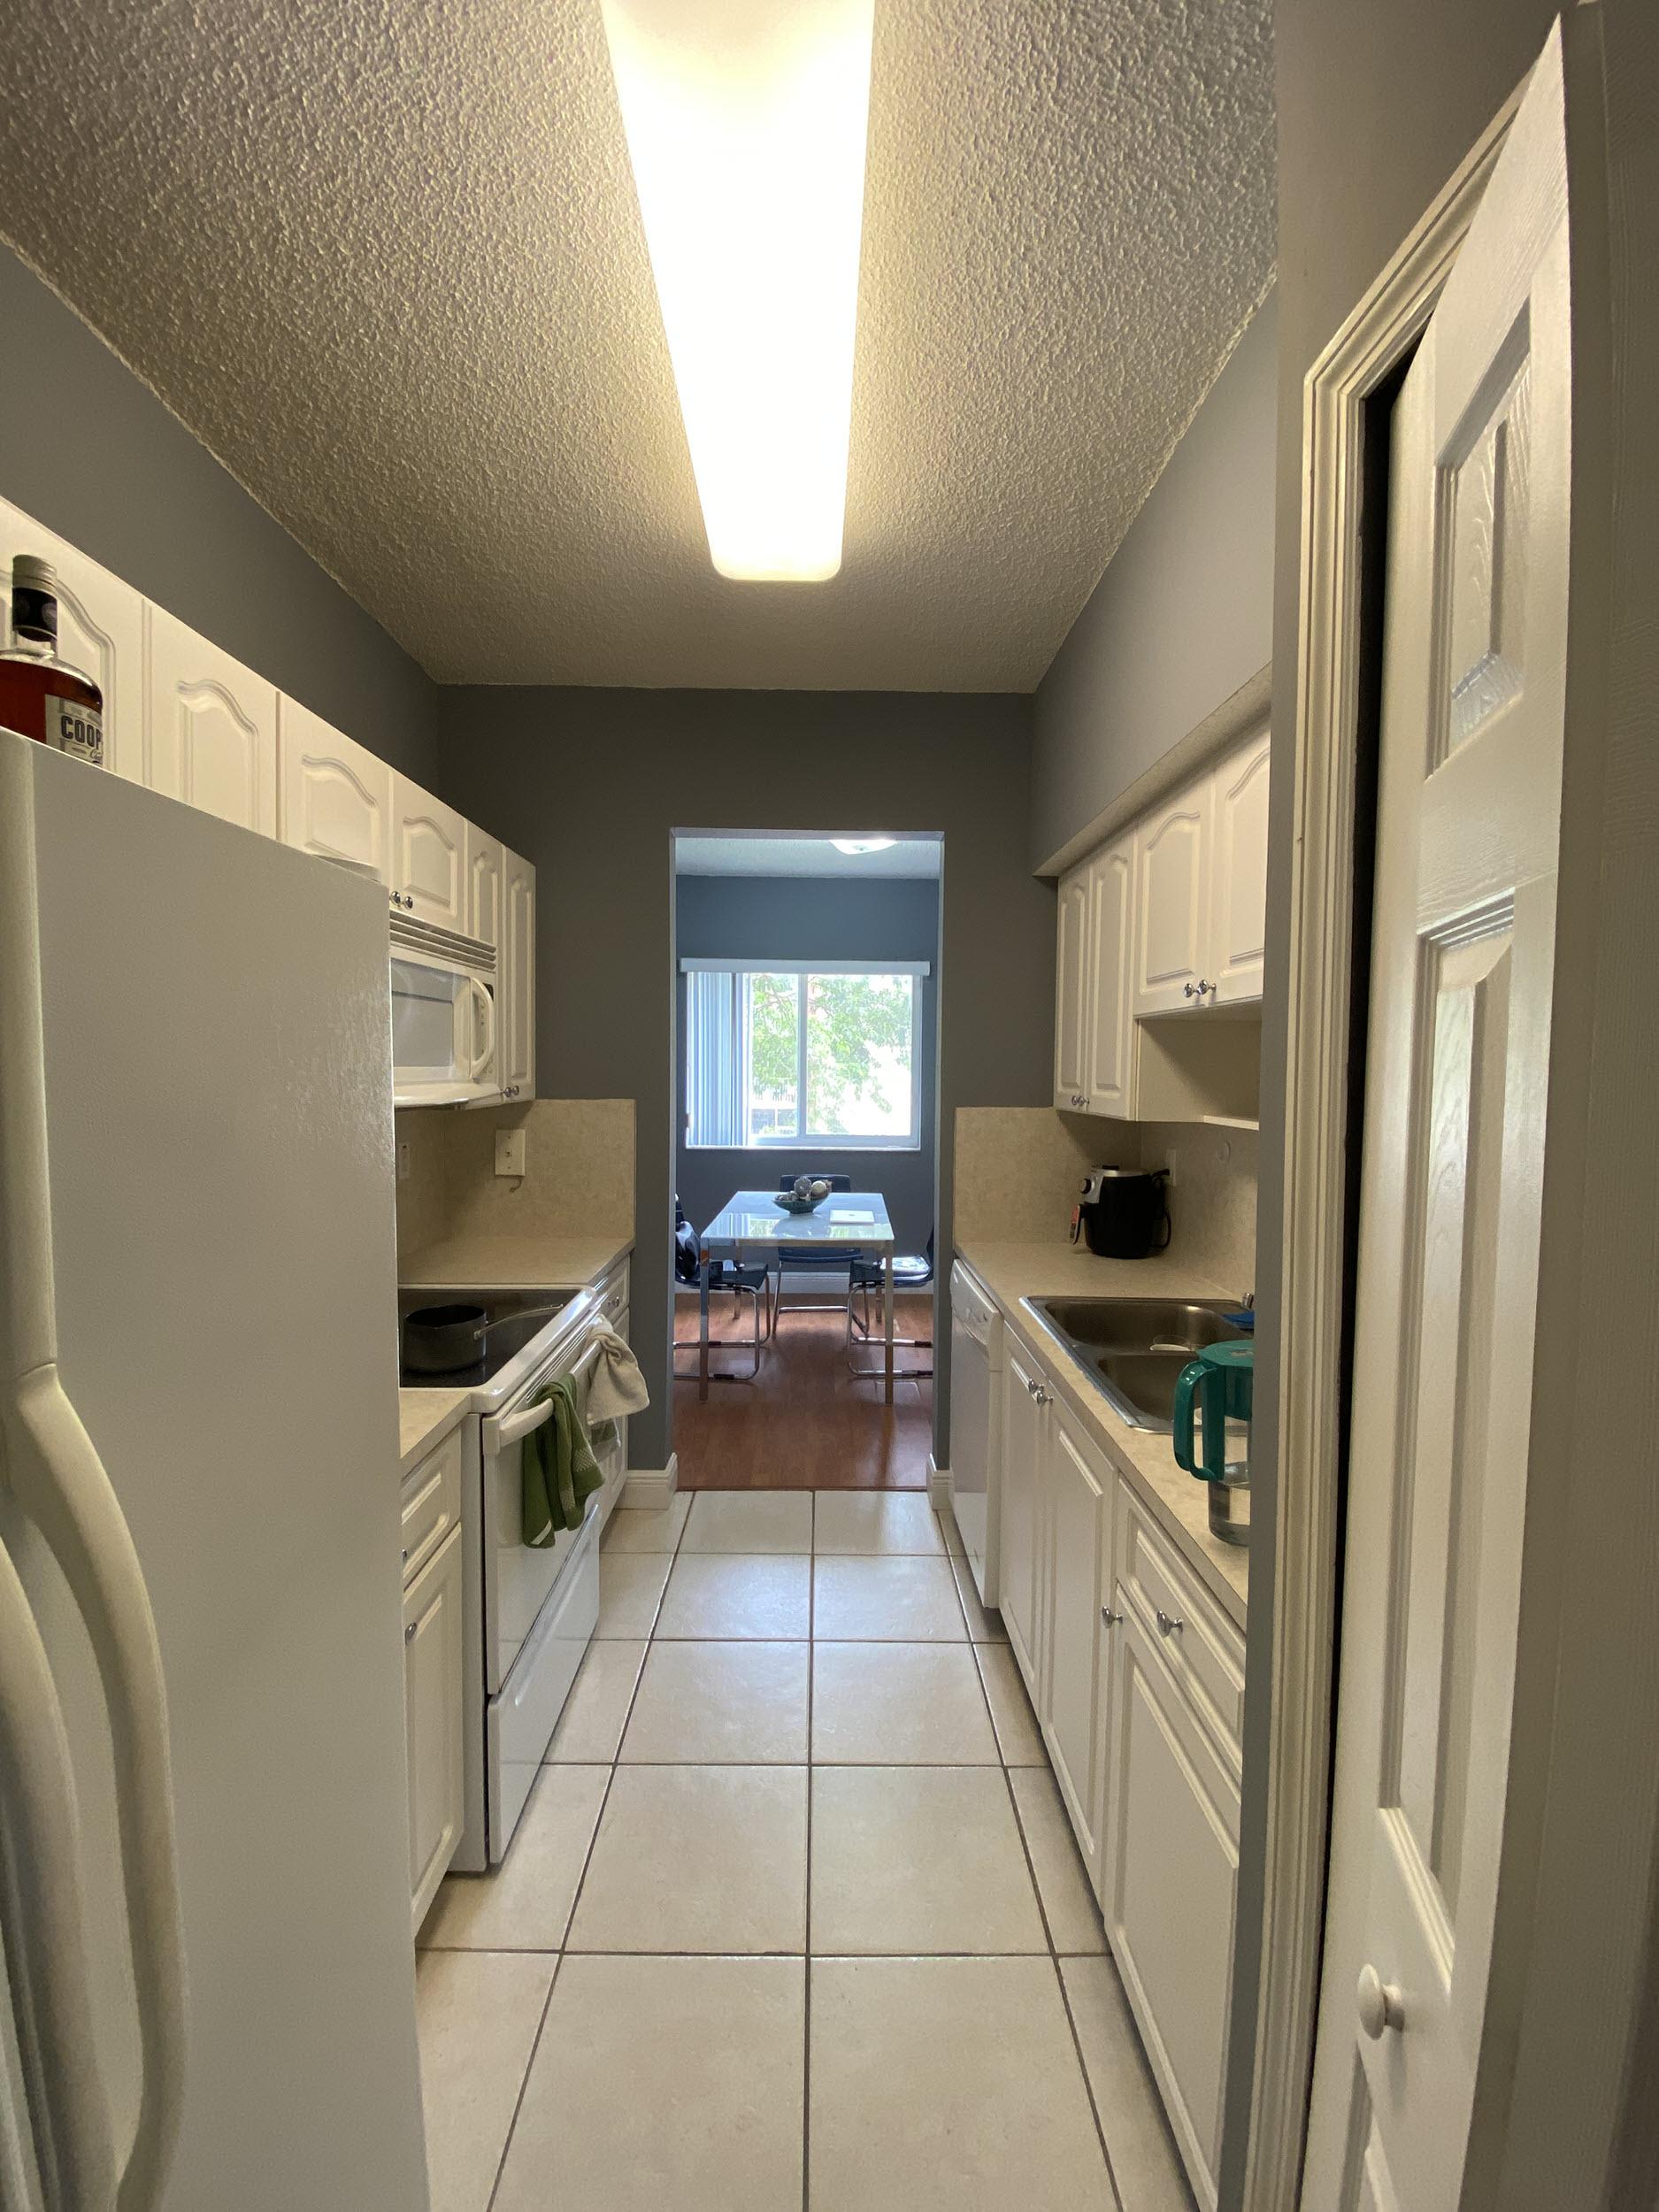 second view of kitchen university parc residence condo unit 220 davie florida